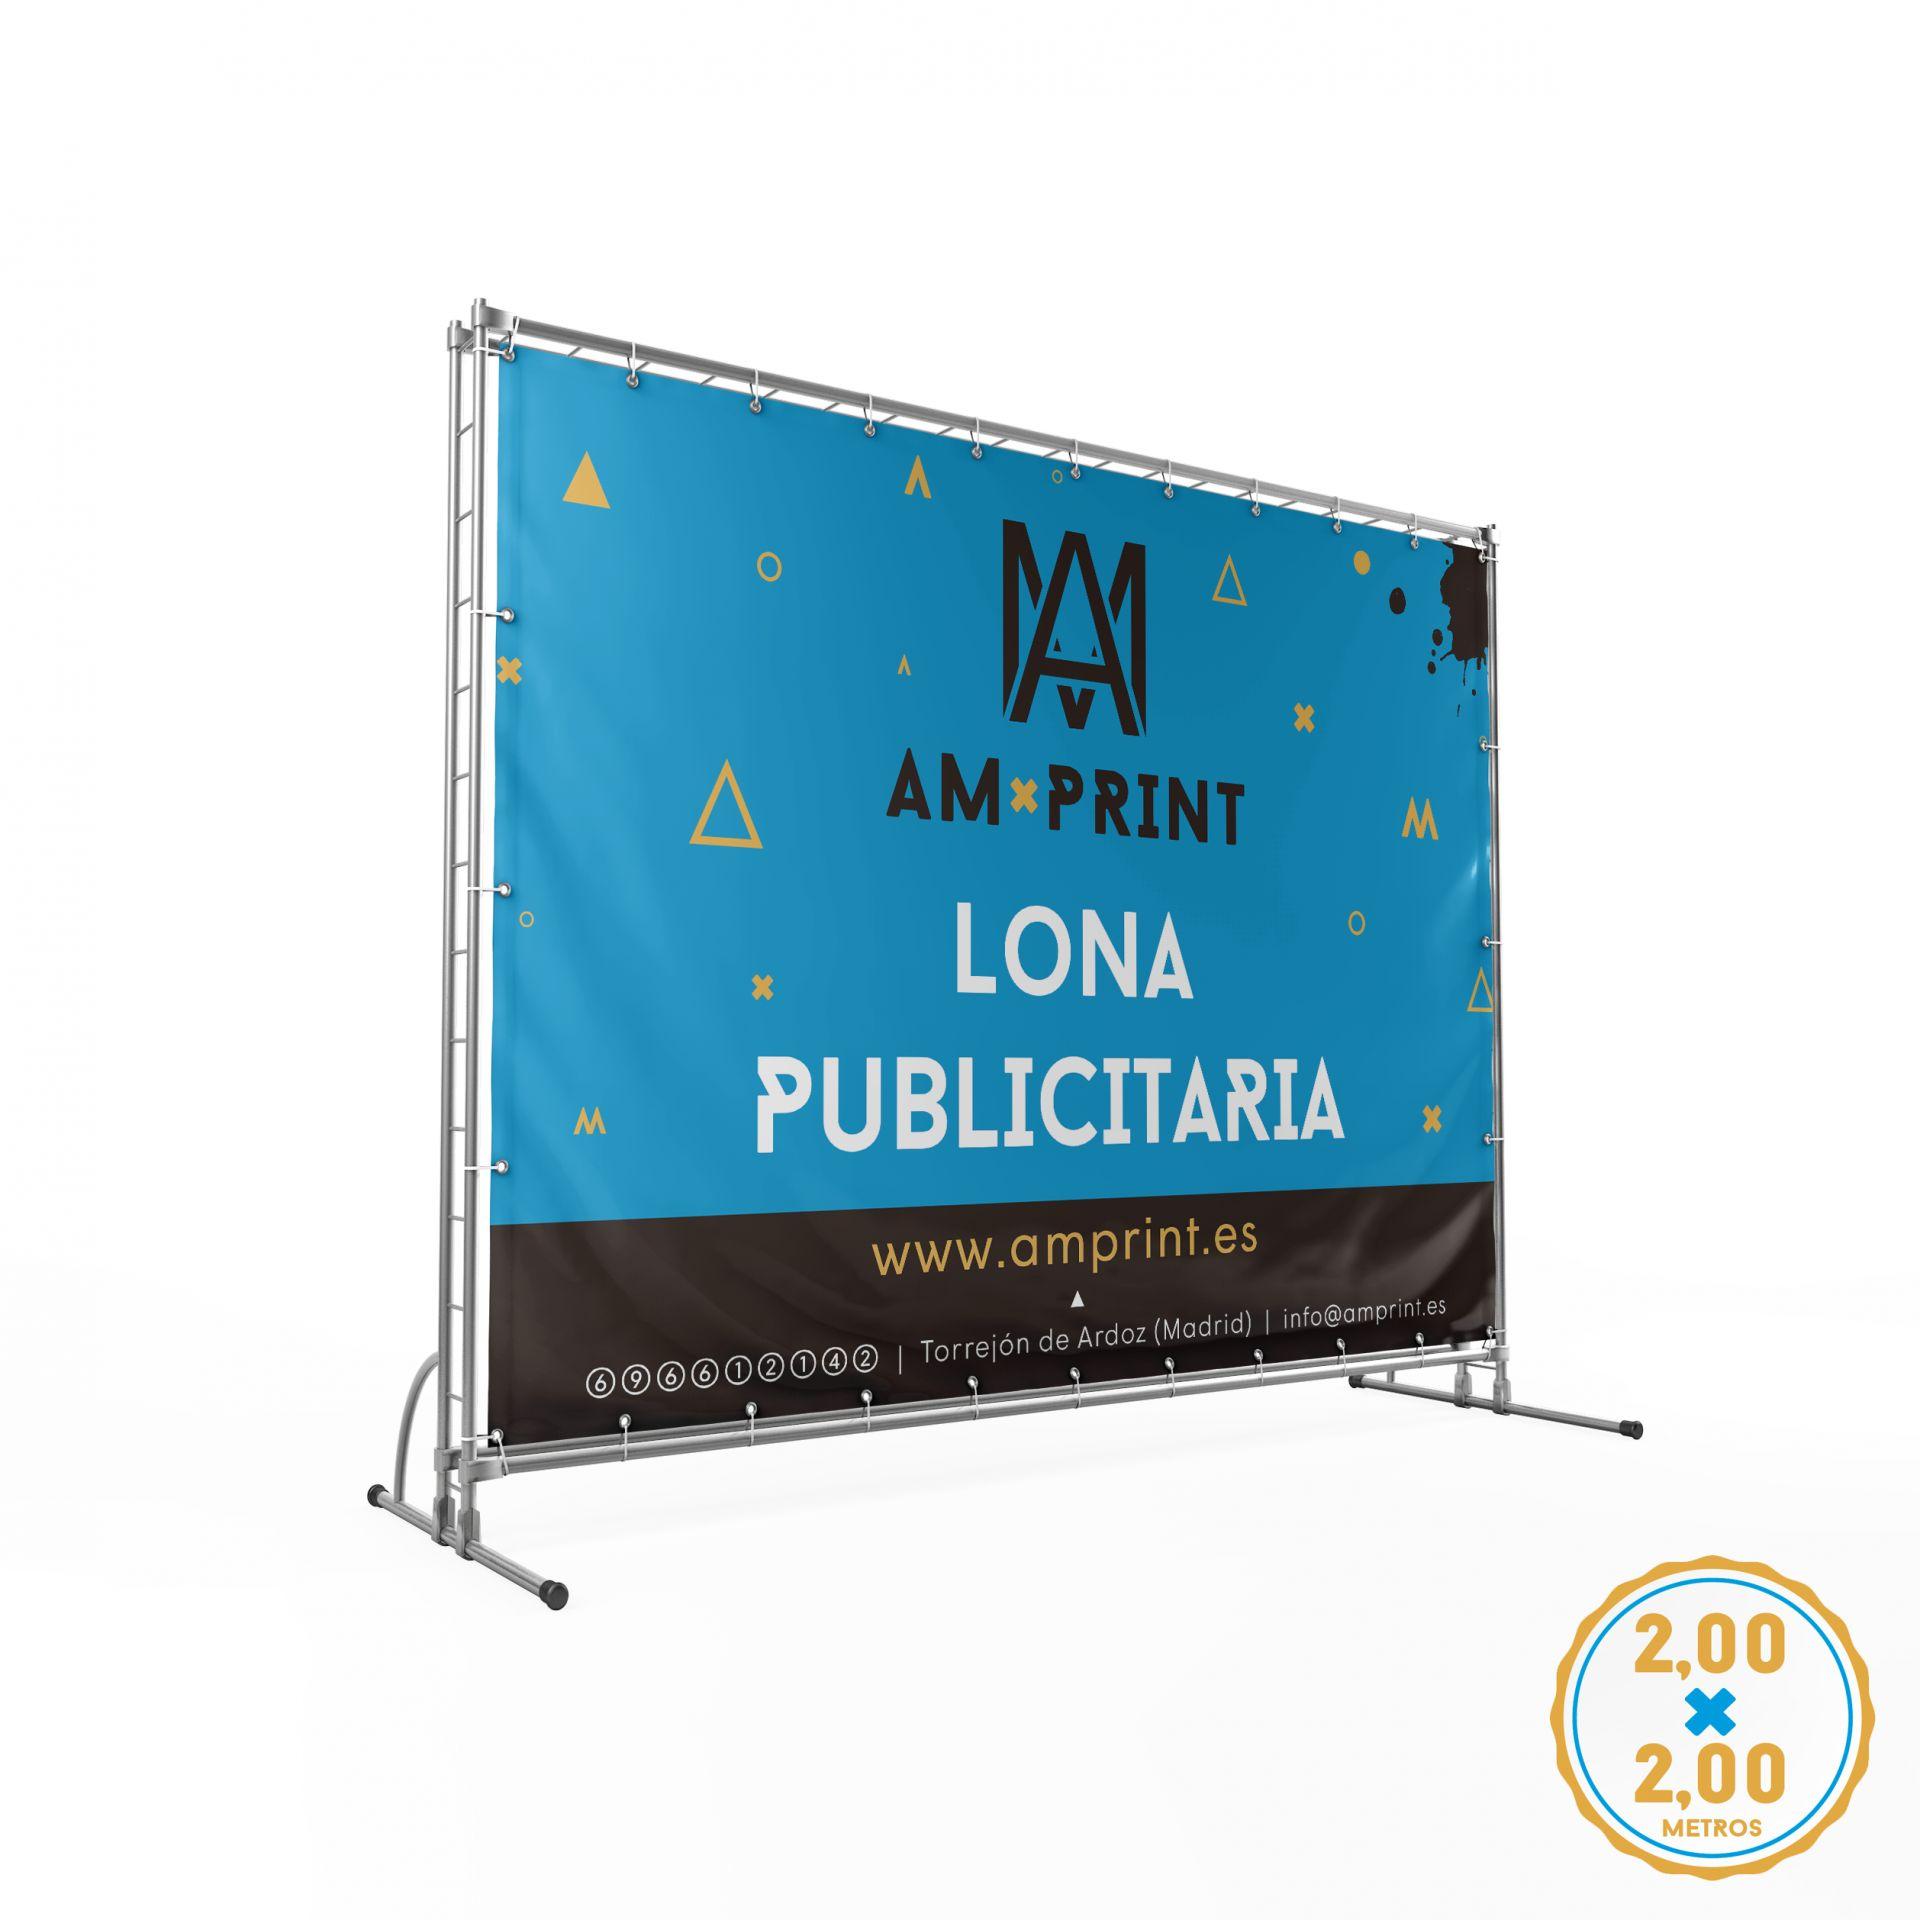 Lona - 2 x 2 m.